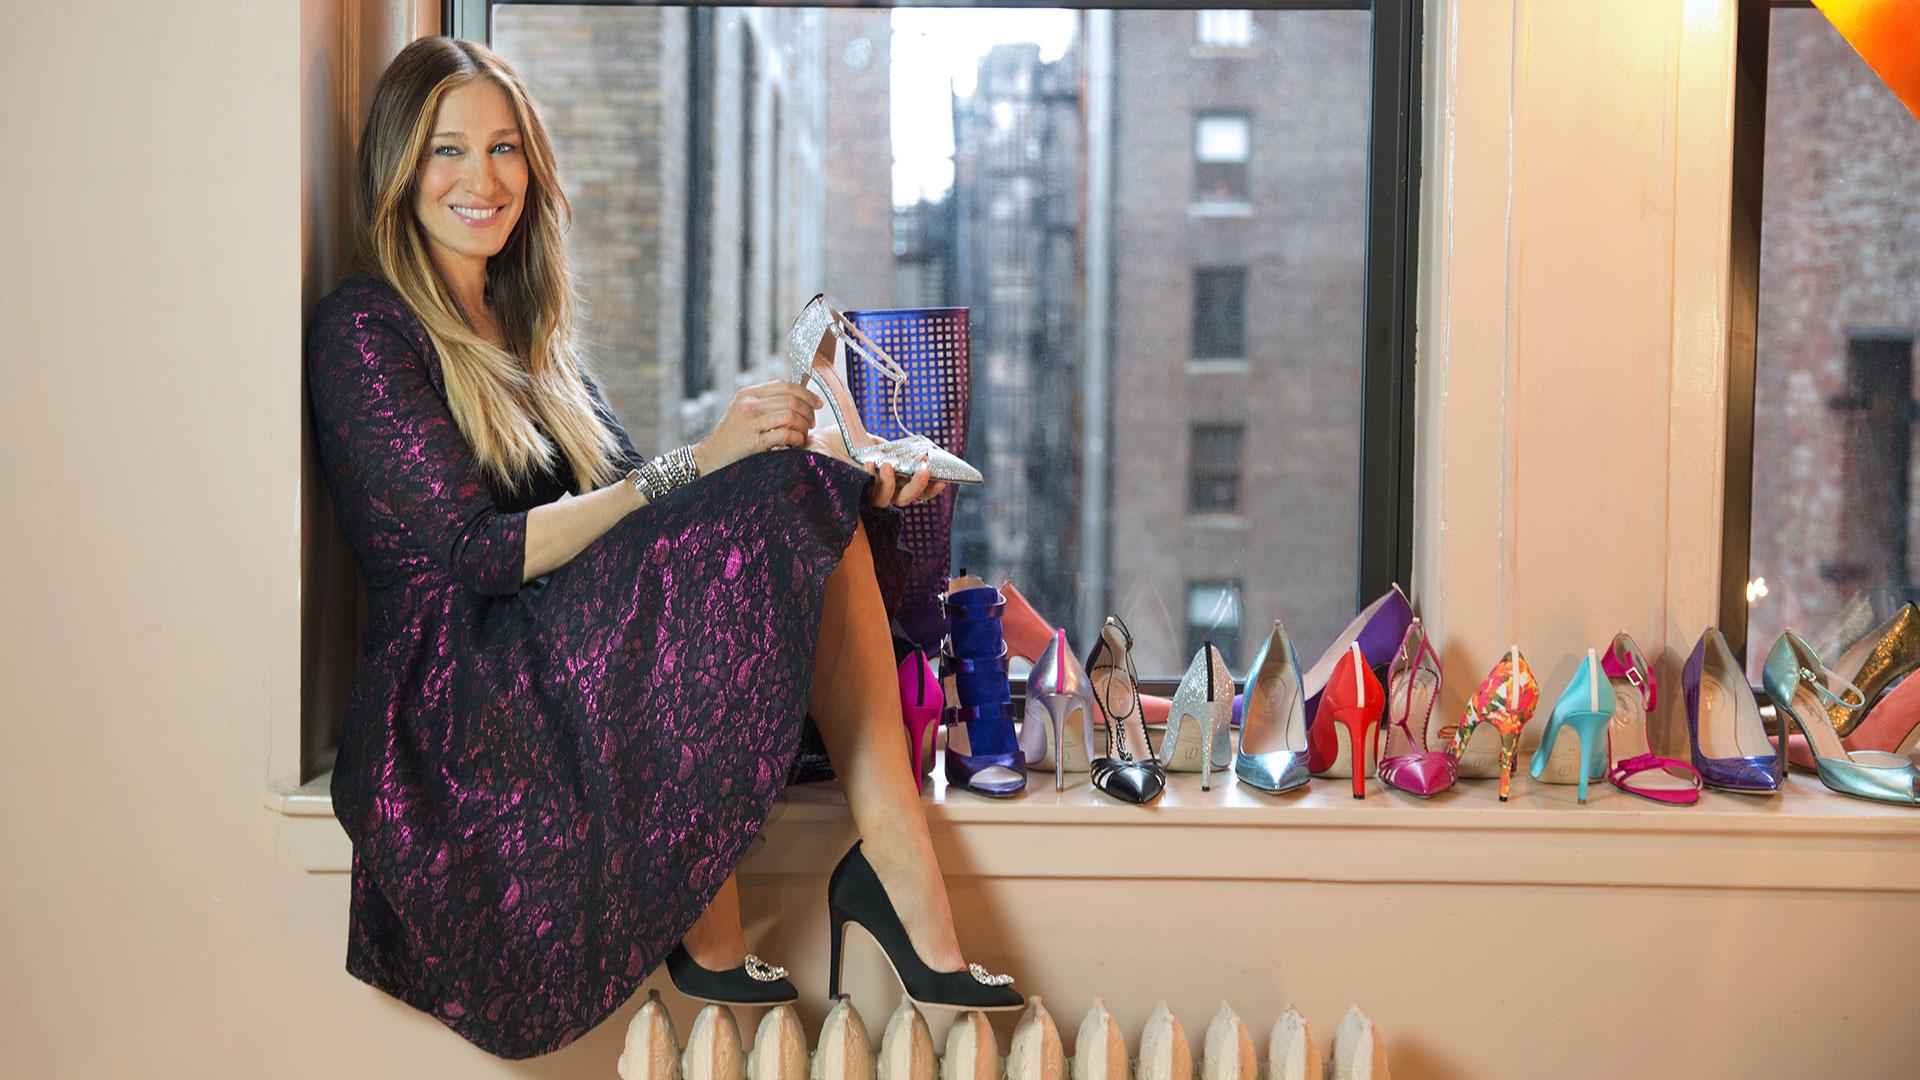 Sarah Jessica Parker hero asset